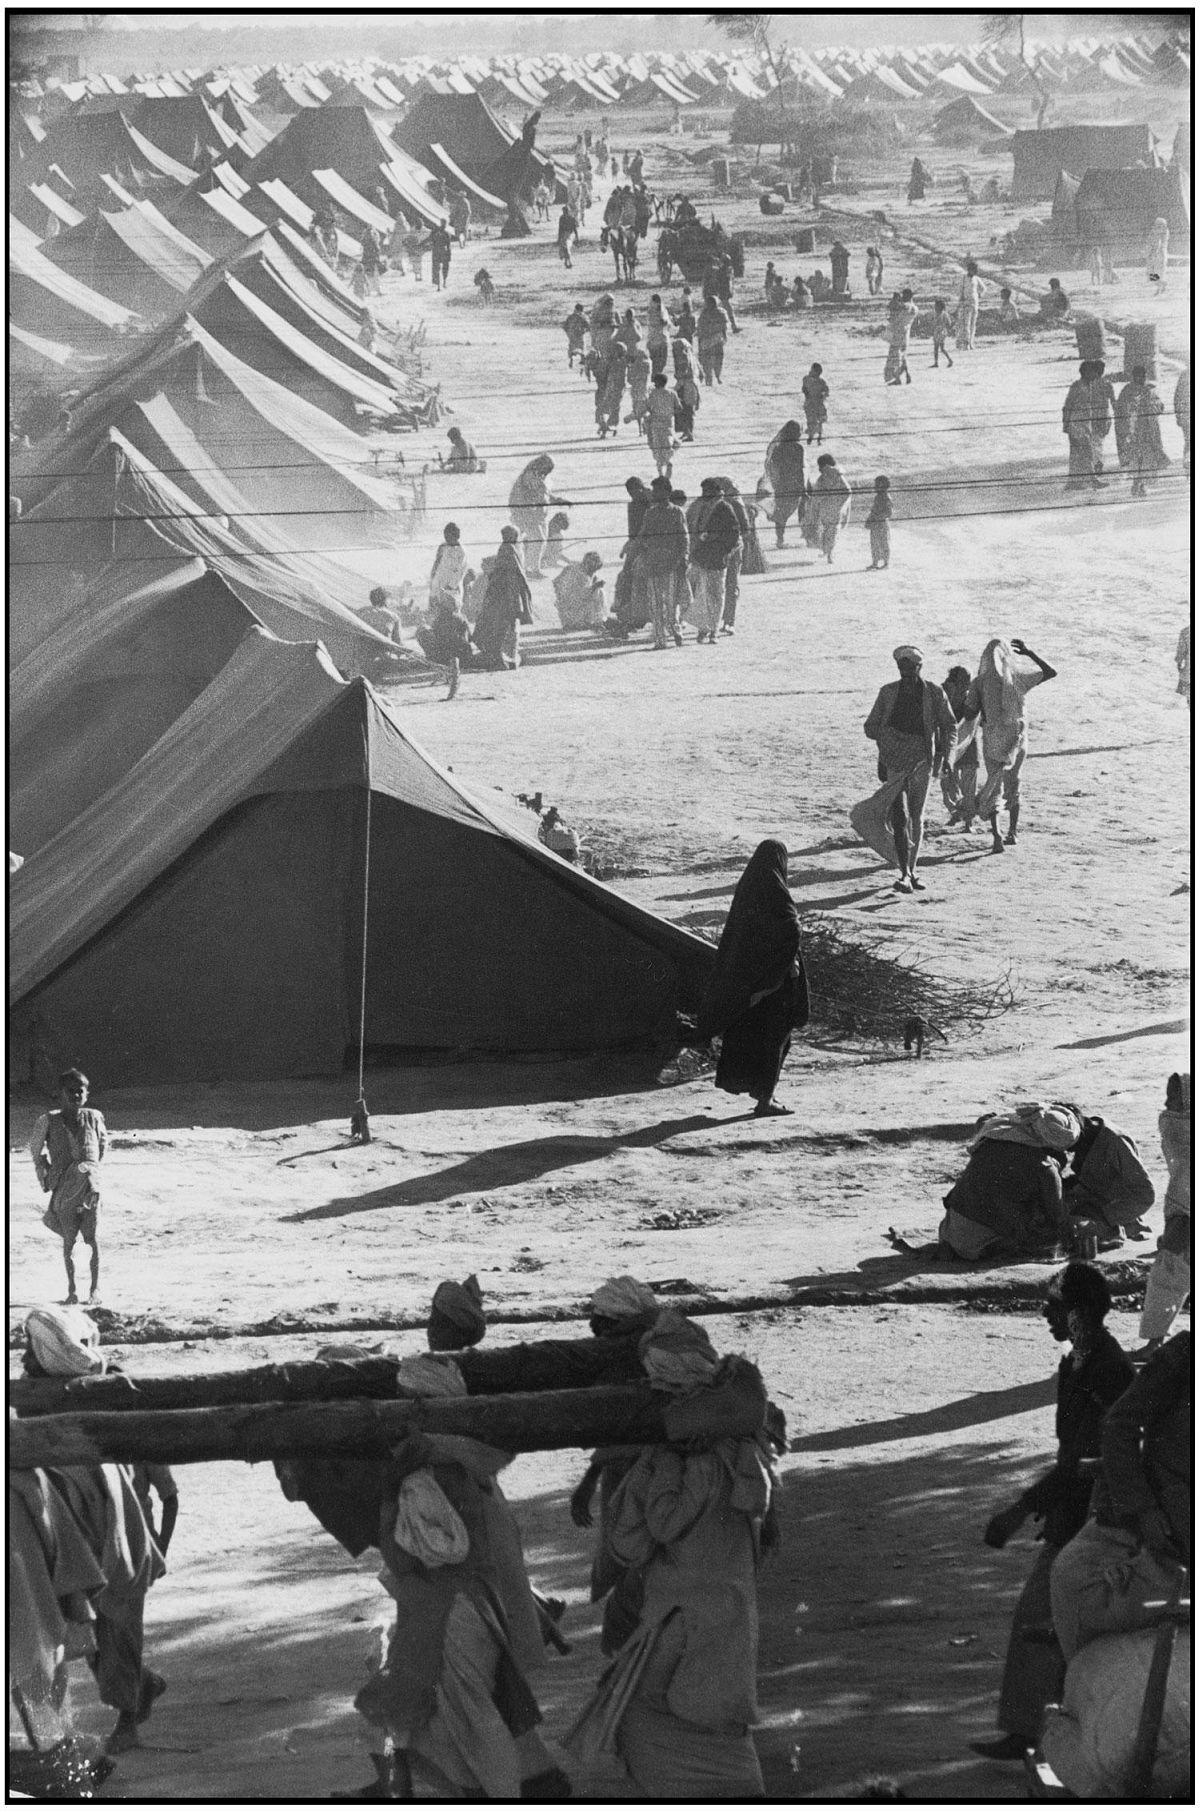 Henri Cartier-Bresson, The Decisive Moment (Simon & Schuster, 1952), p. 93, A Refugee Camp, Kurukshetra, India, 1947. © Henri Cartier-Bresson/Magnum Photos.